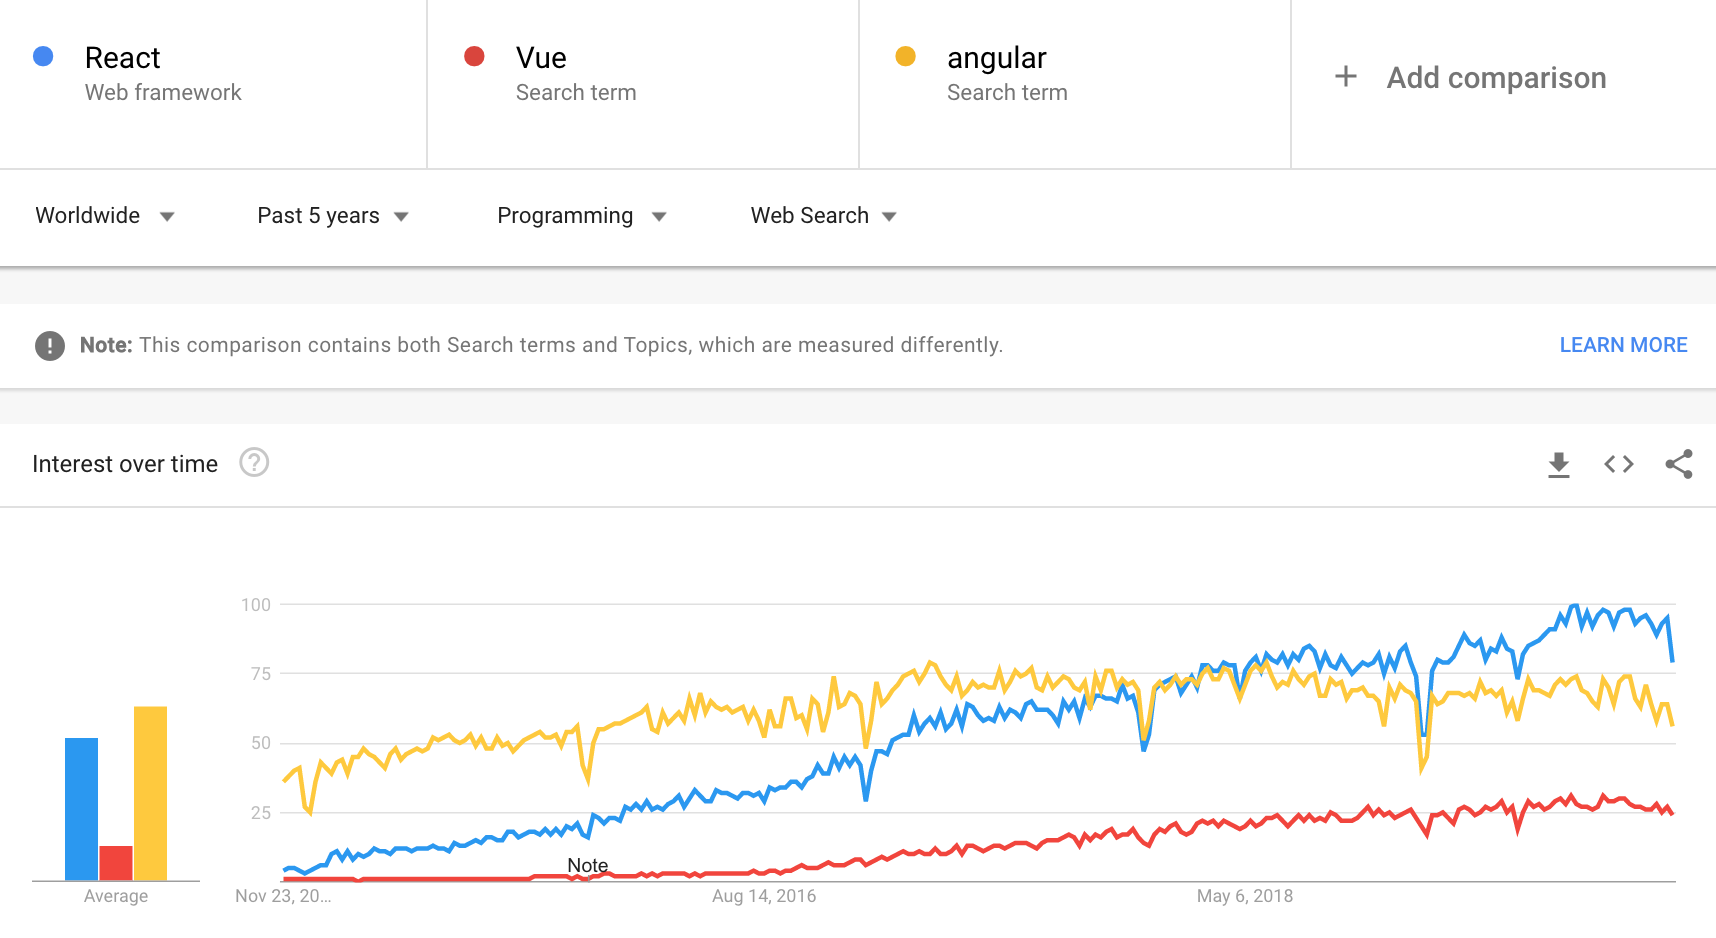 Google trends comparison of React vs Vue vs Angular